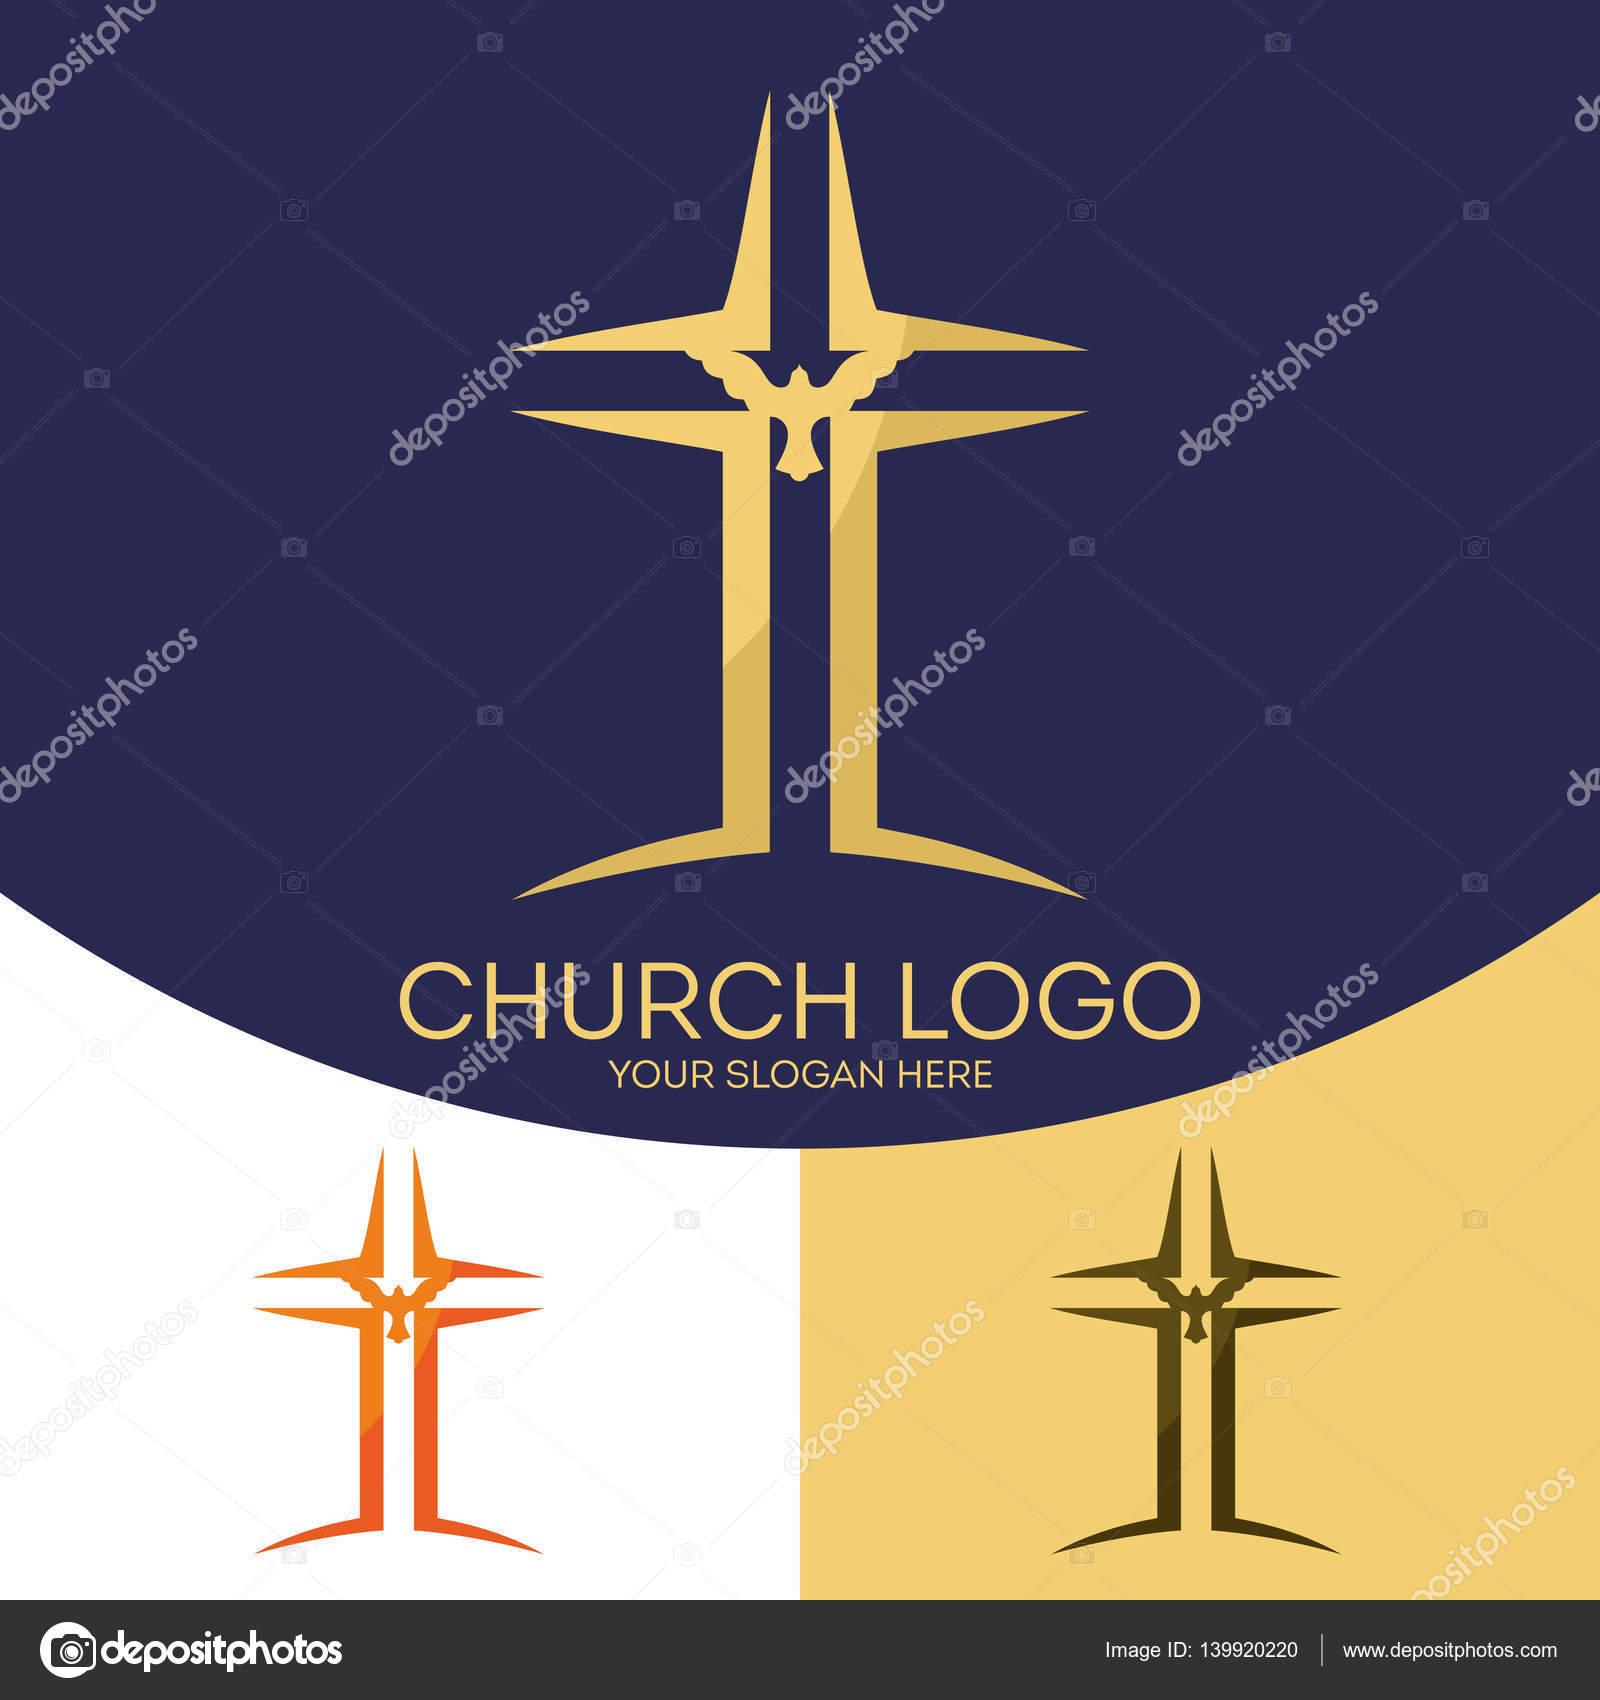 church logo christian symbols the cross of jesus christ the